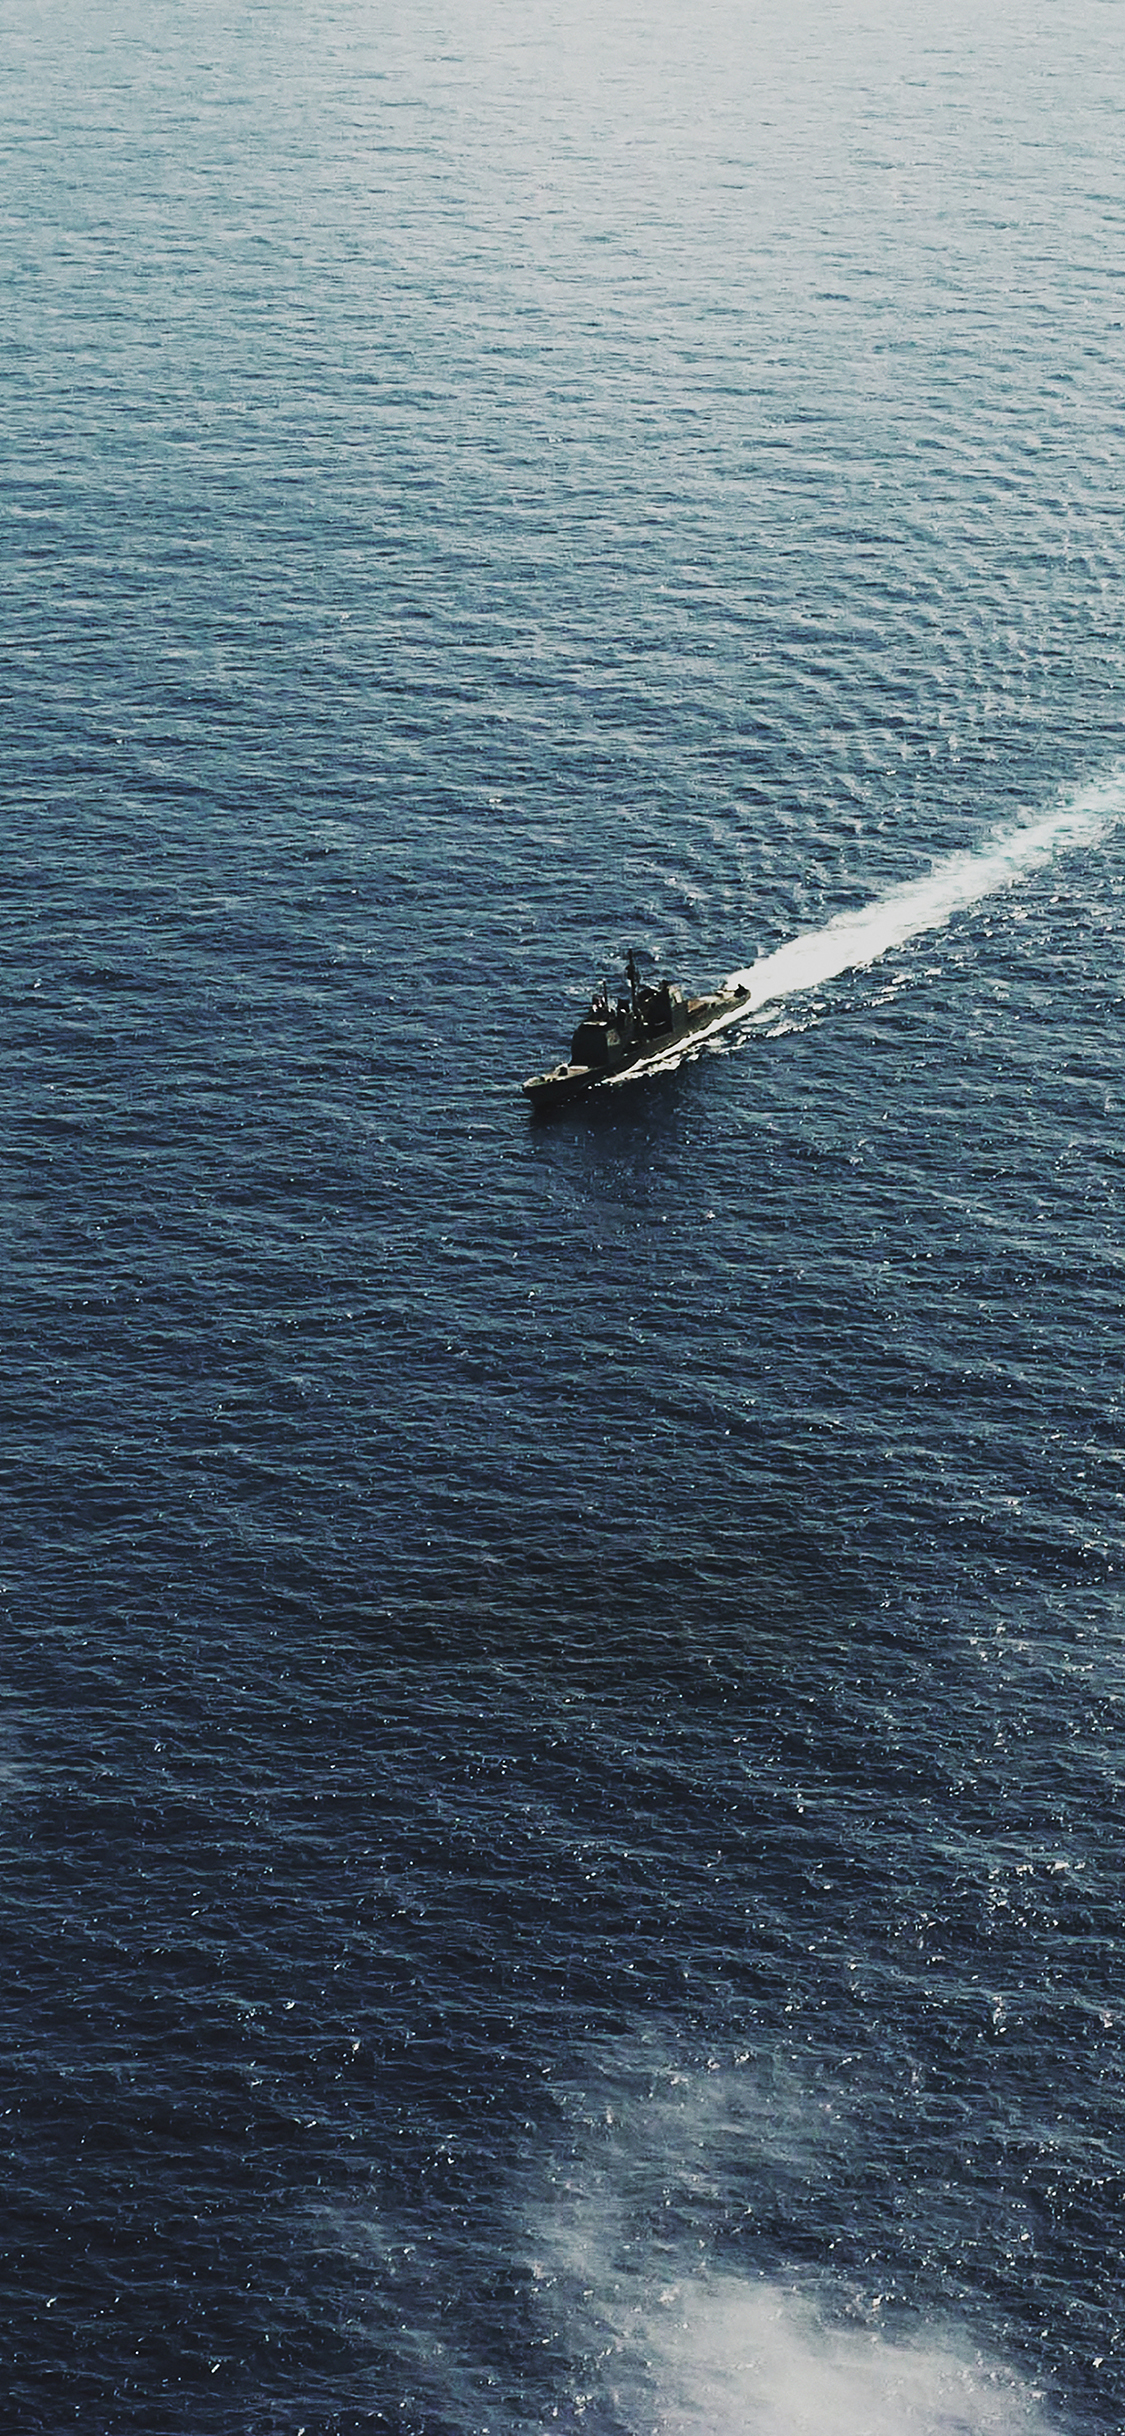 iphonexpapers | iphone x wallpaper | mh28-ocean-ship-sea-sunny